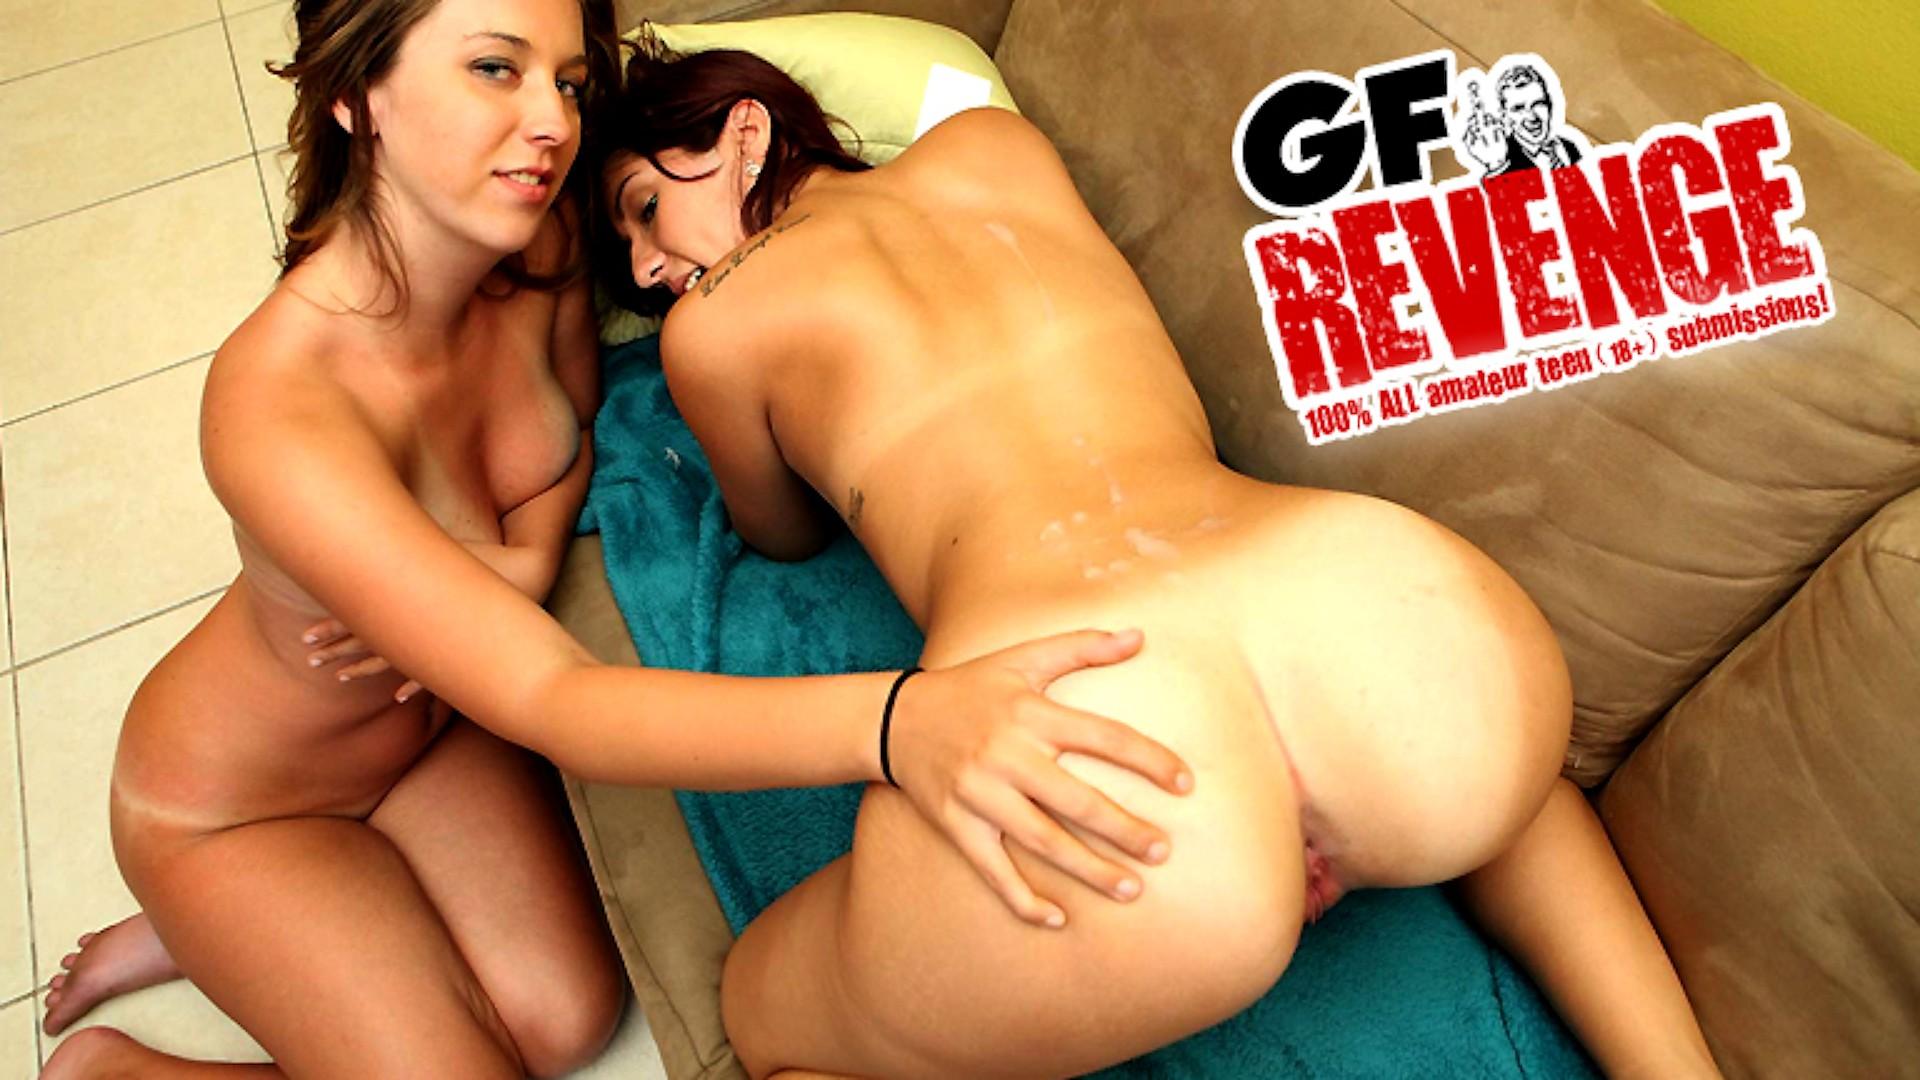 Beautiful Belle - GF Revenge